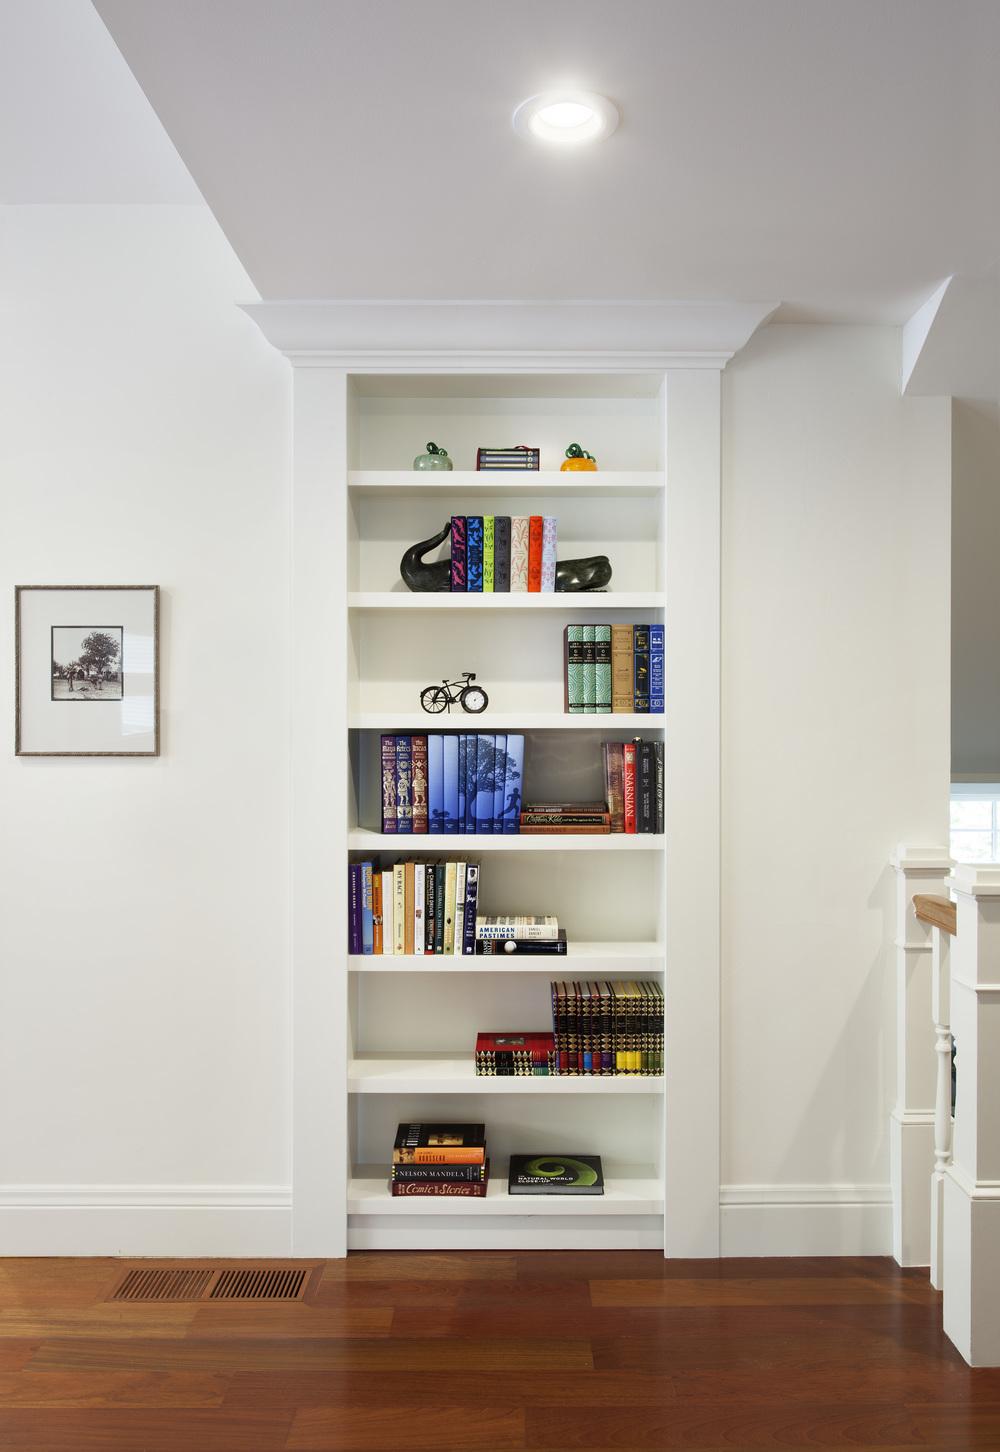 009 Bookshelf Door Closed_8x10 version_jpg.jpg